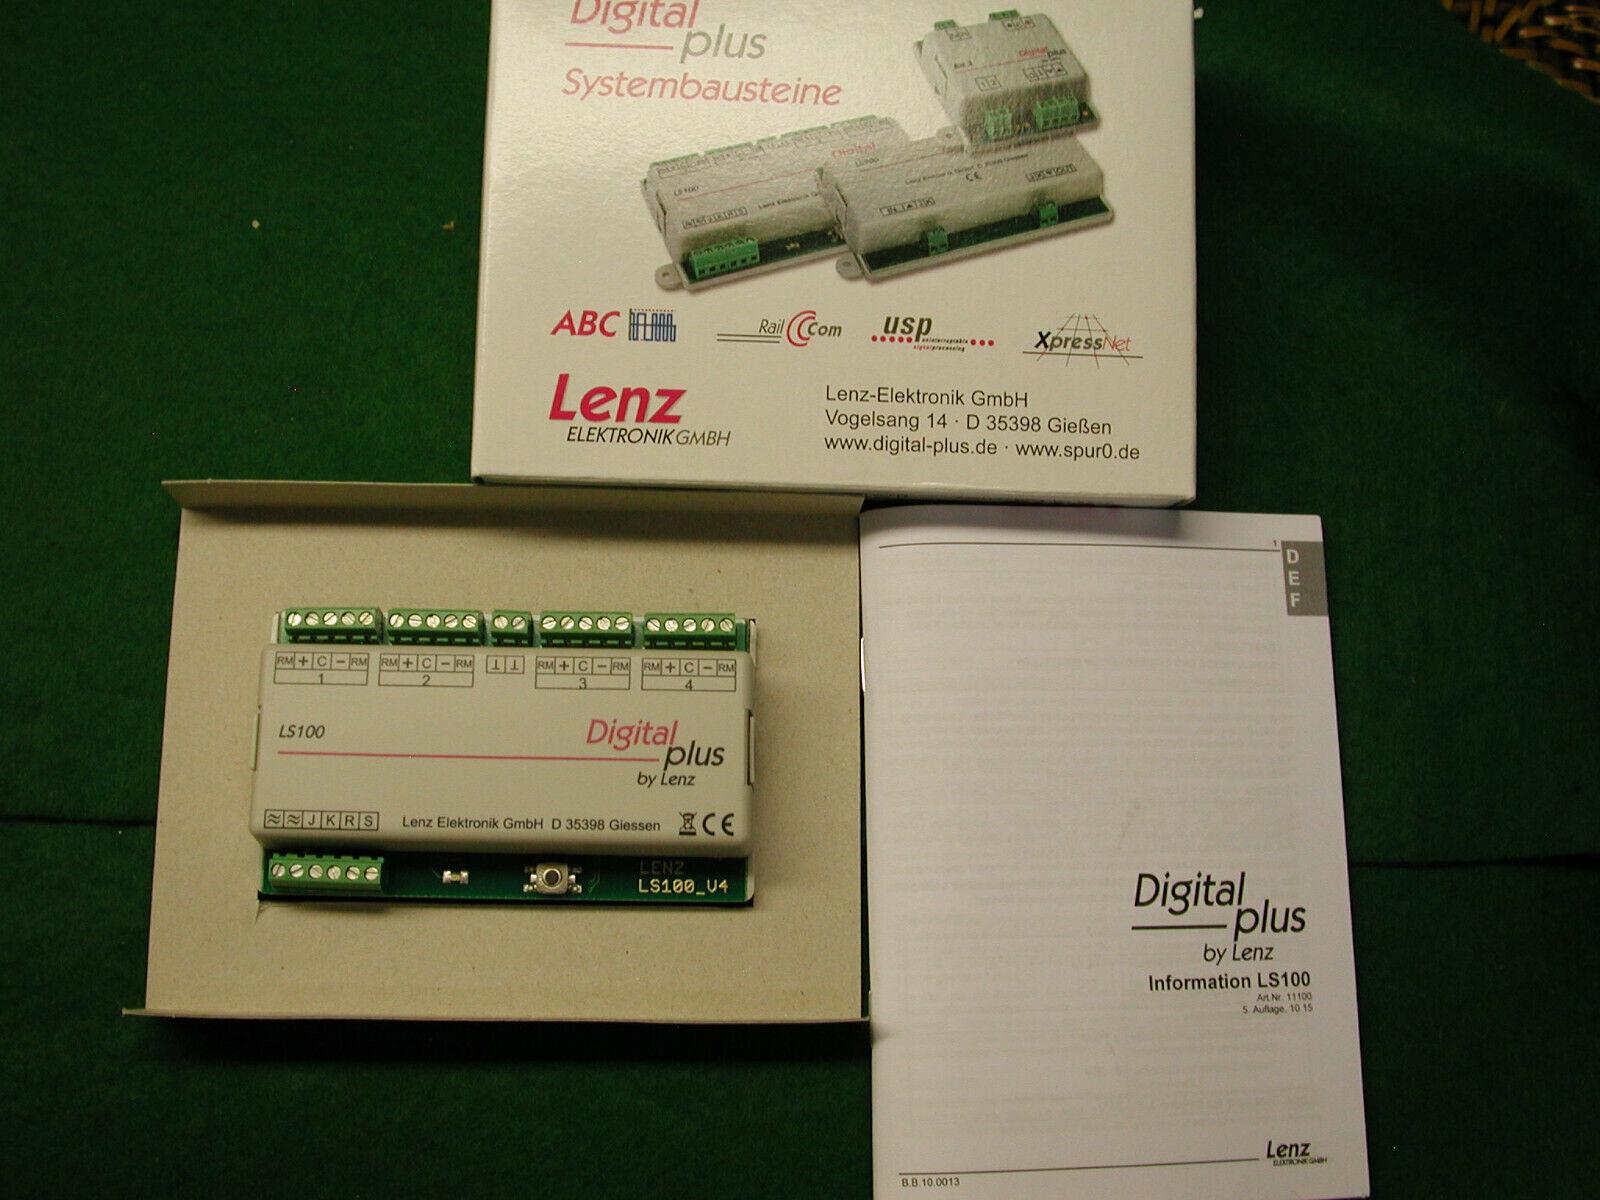 Lenz DCC Elektronik GmbH LS100 módulo de conmutador de posición de cuatro a estrenar en caja